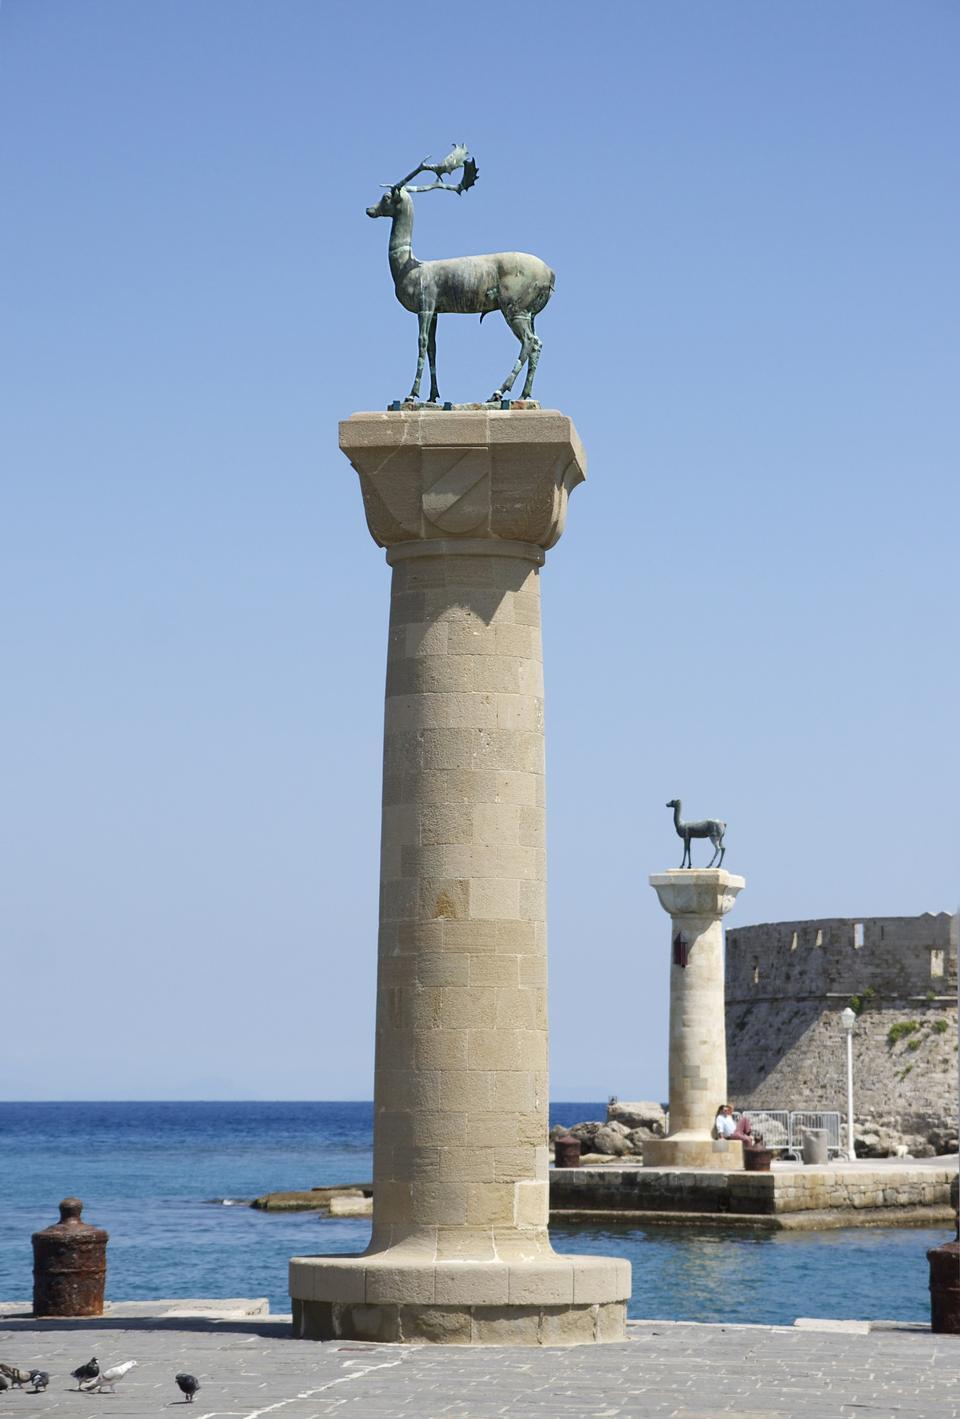 Mandraki海港有和青銅雕像鹿 - 羅得島,希臘島